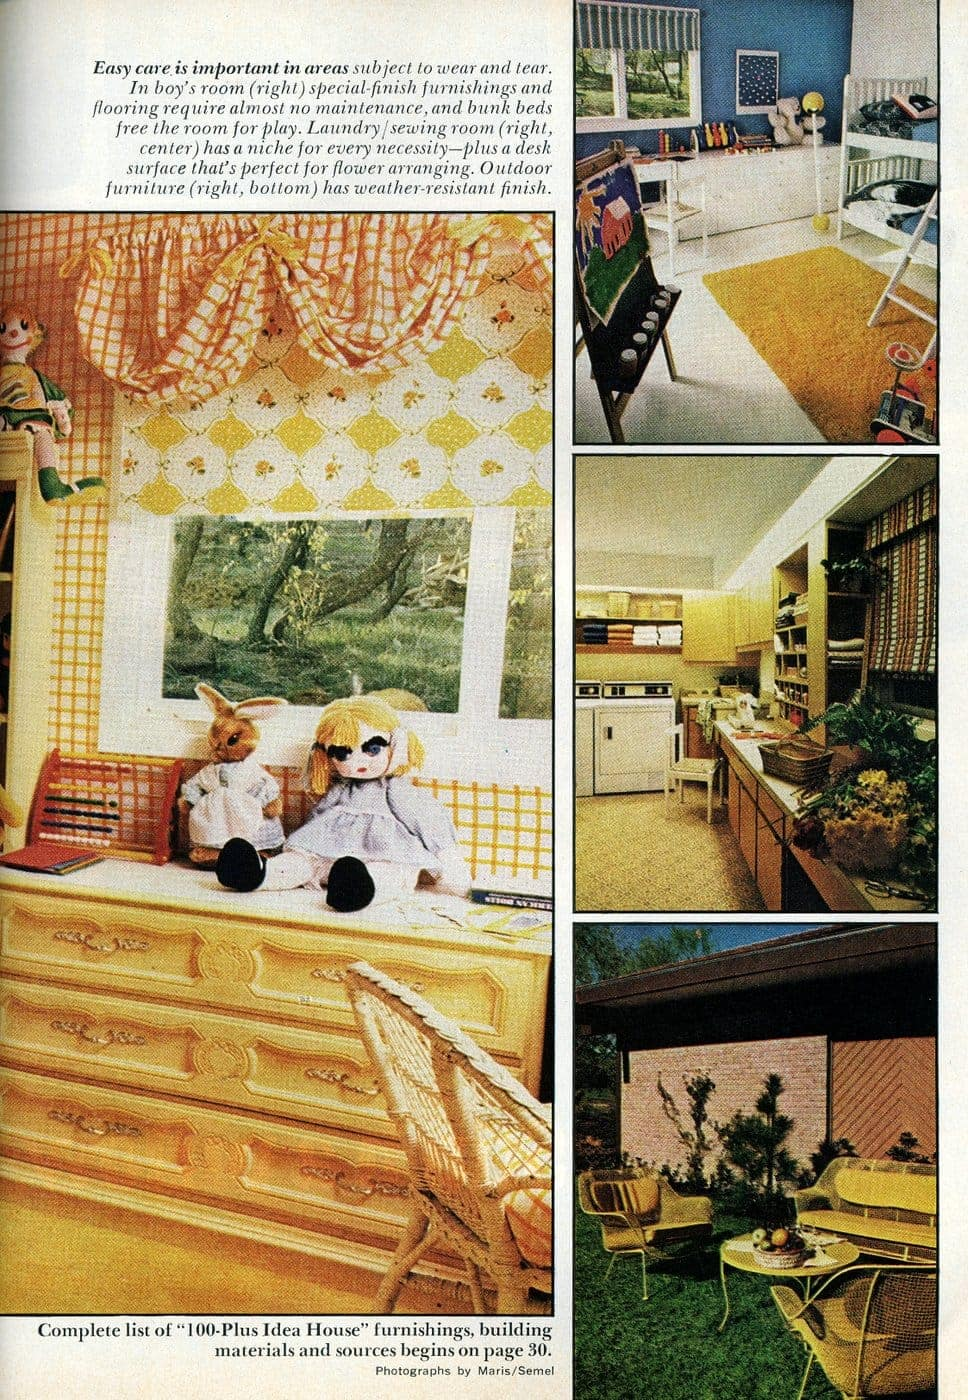 Beautiful practical 1975 model home - Bedrooms laundry backyard